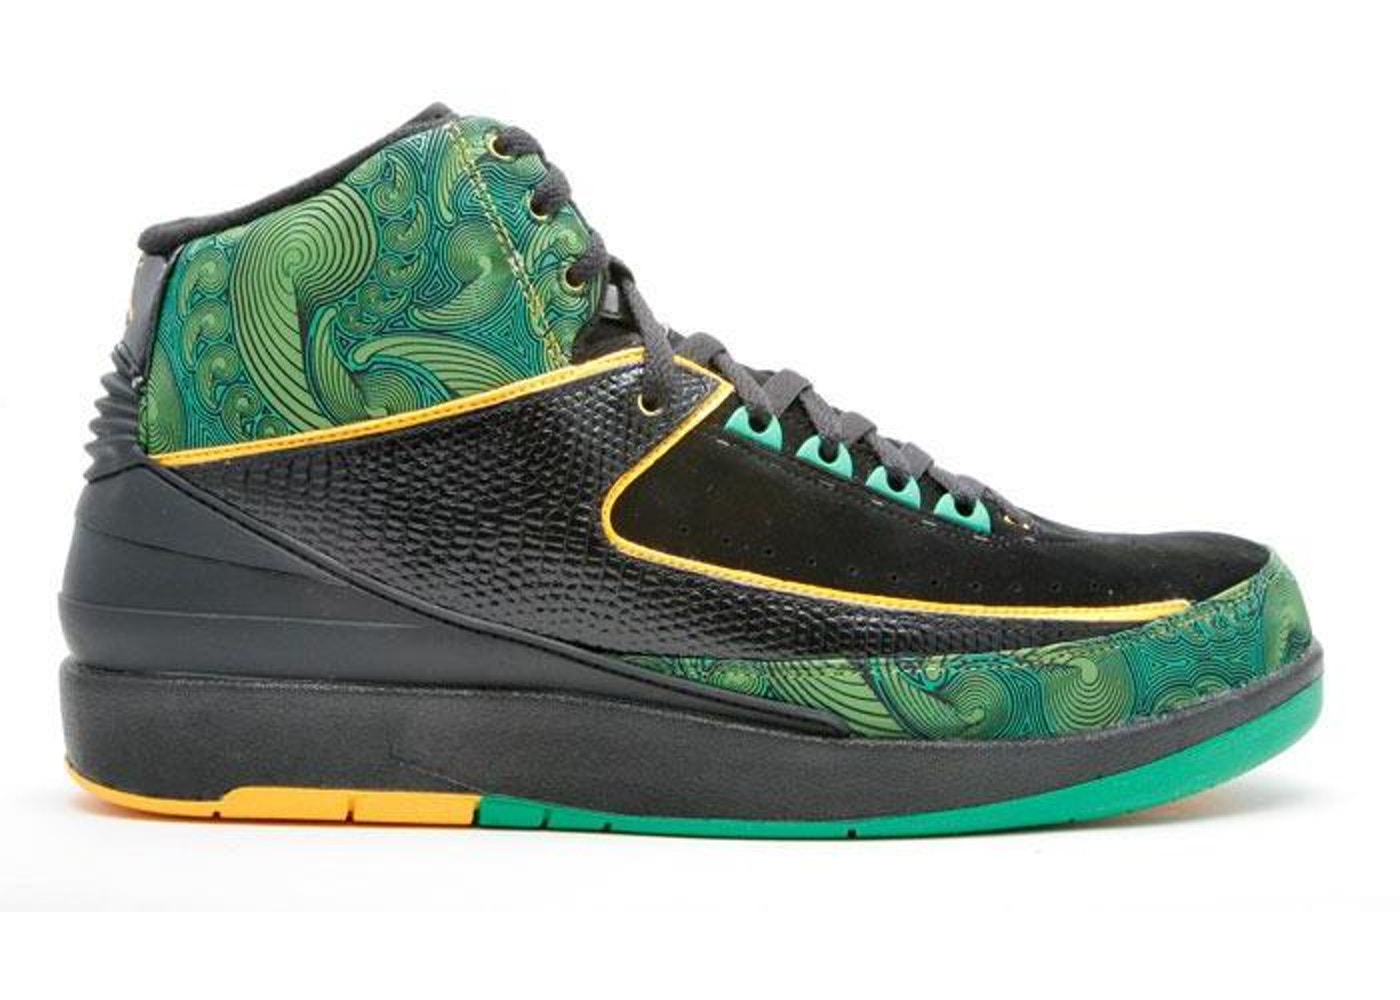 separation shoes f60ef 033d2 Jordan 2 Retro Doernbecher Peacock - 318304-071